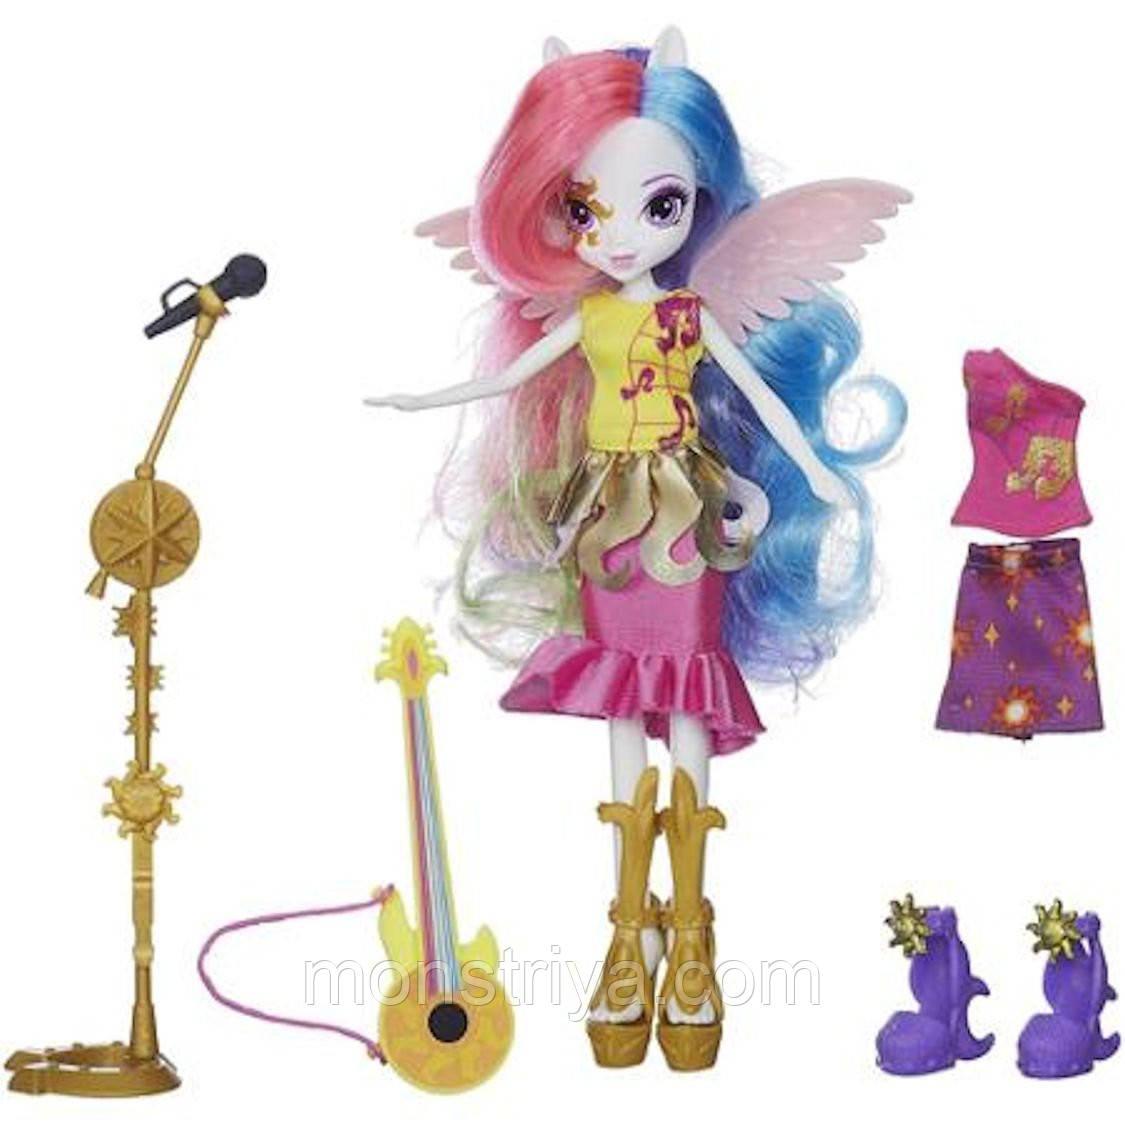 "Ексклюзивна серія My Little Pony Equestria Girls ""Through The Mirror"" (""Задзеркаллі"") Лялька Принцеса Селестія"